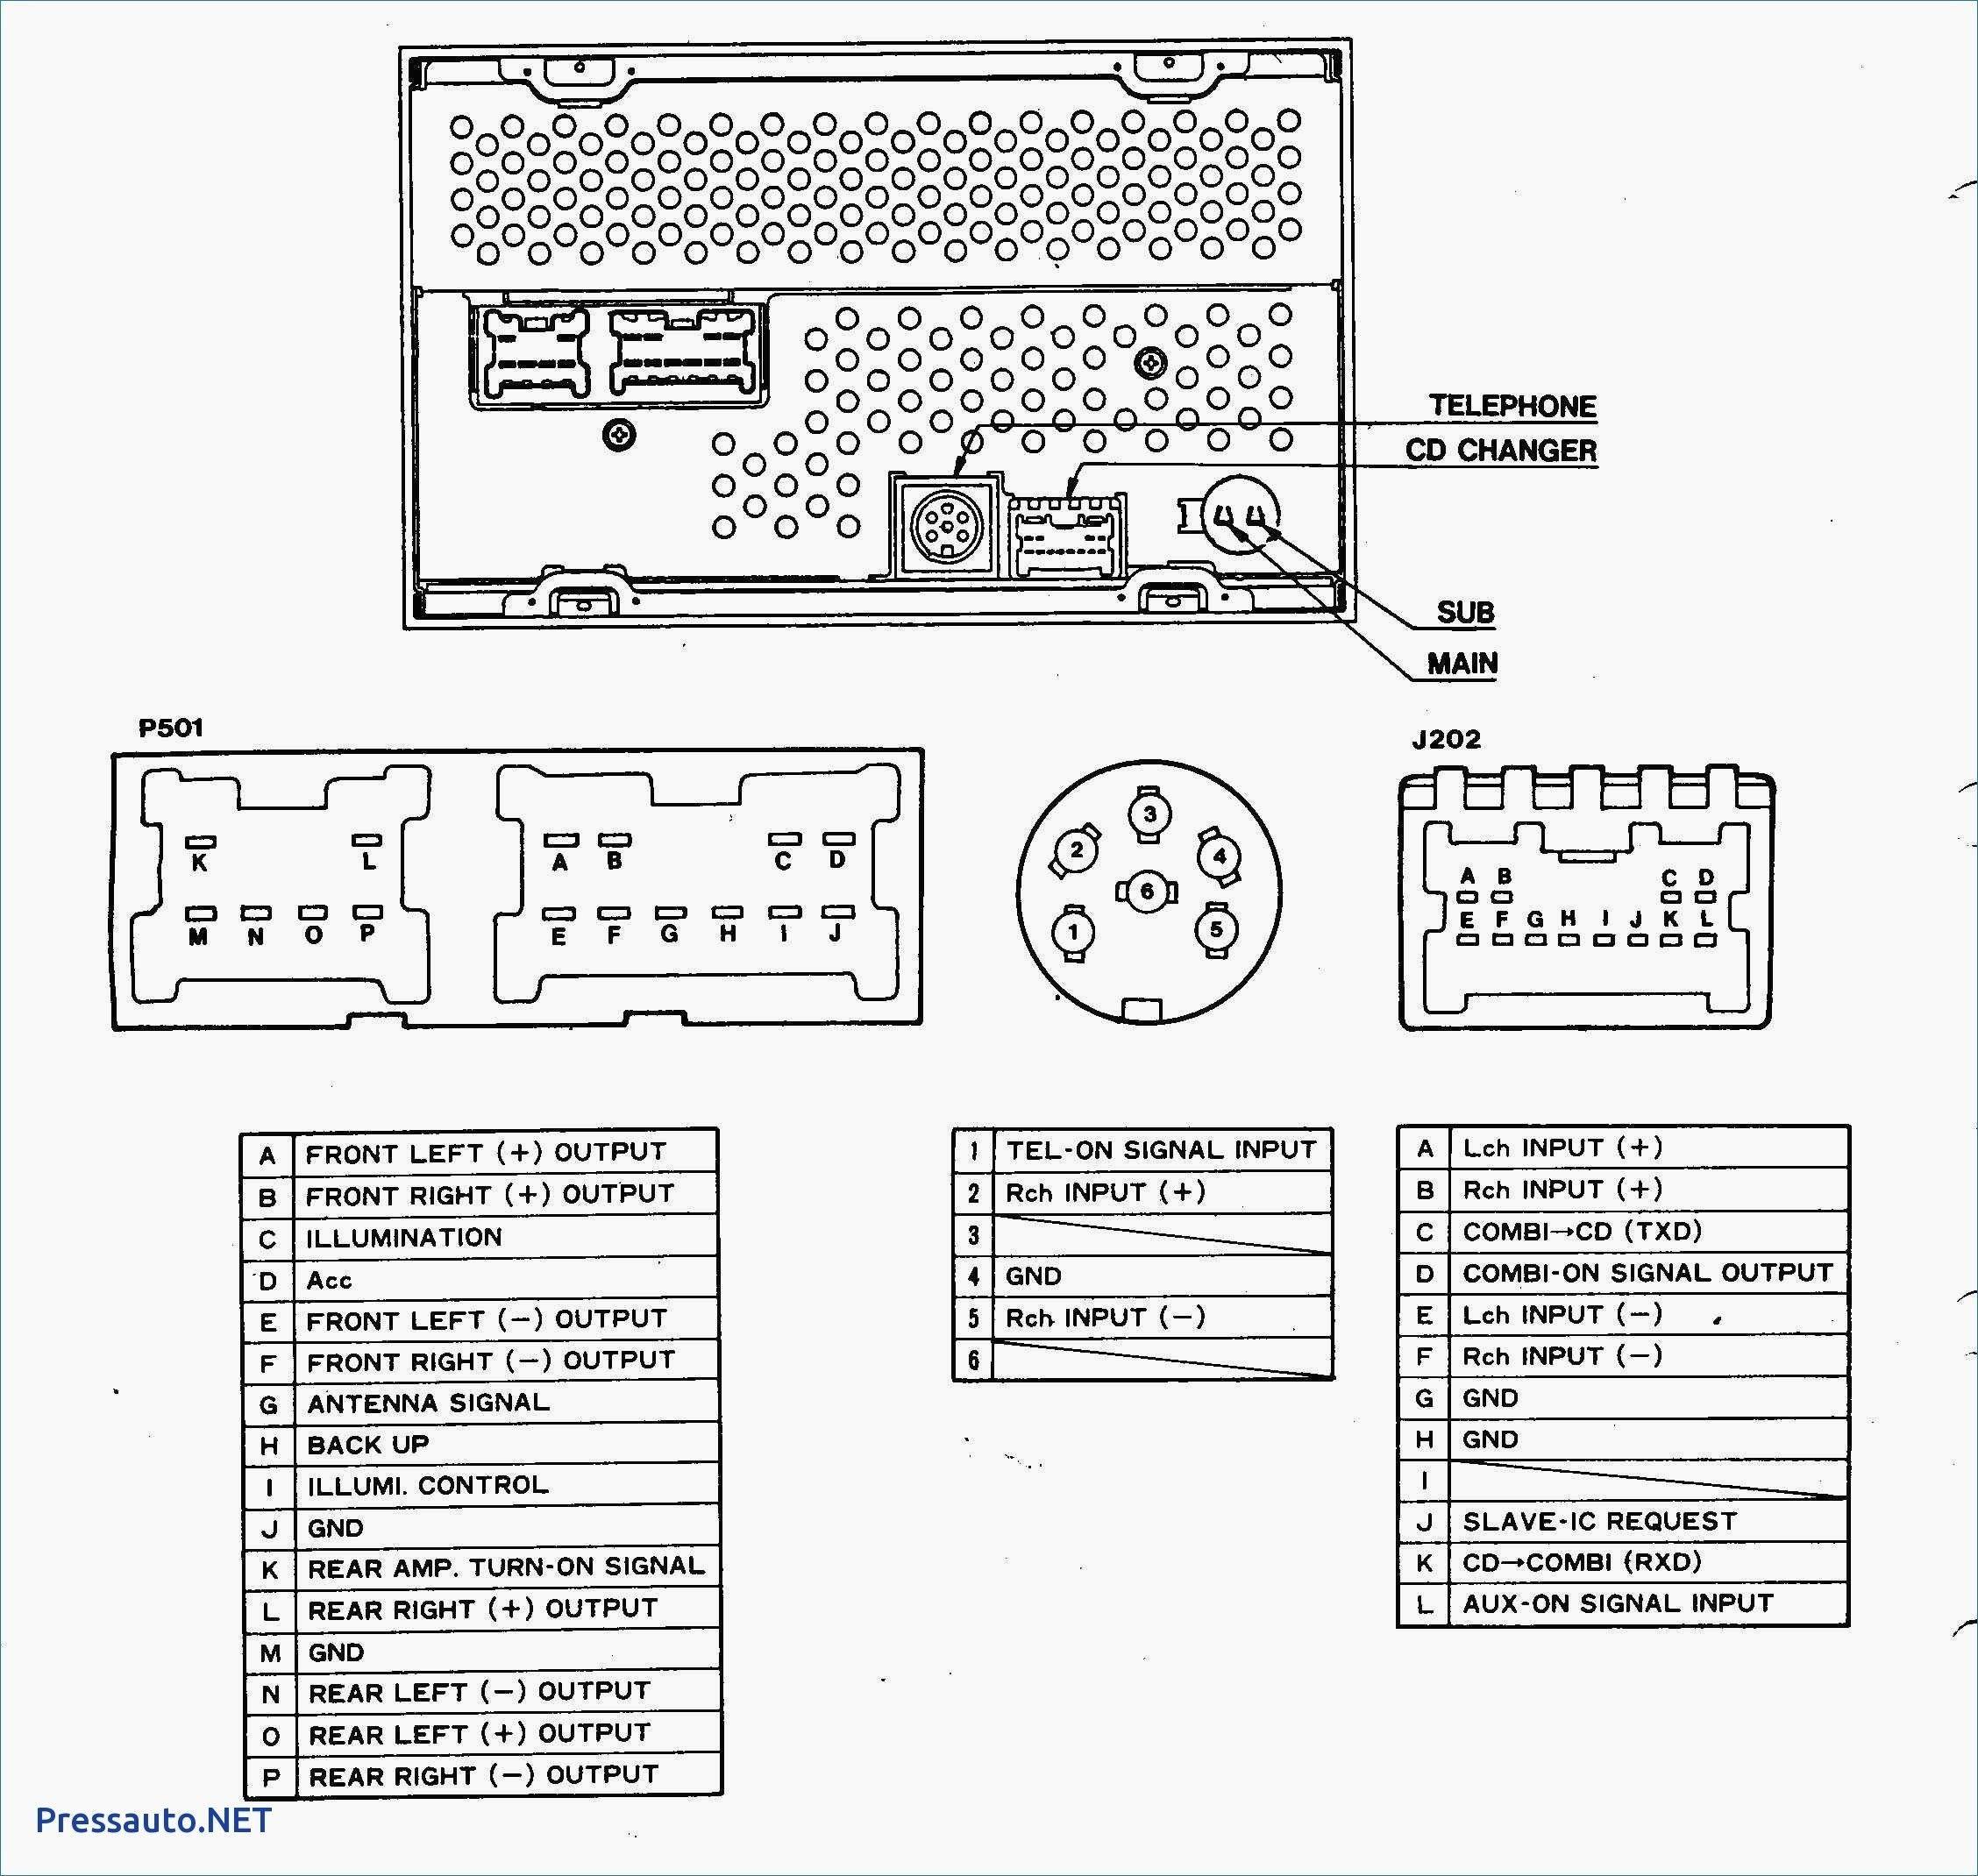 Unique Dvd Car Stereo Wiring Diagram Diagram Diagramtemplate Diagramsample Check More At Https Servisi Co Dv Con Imagenes Audio Coche Combi Fondos De Pantalla Animales